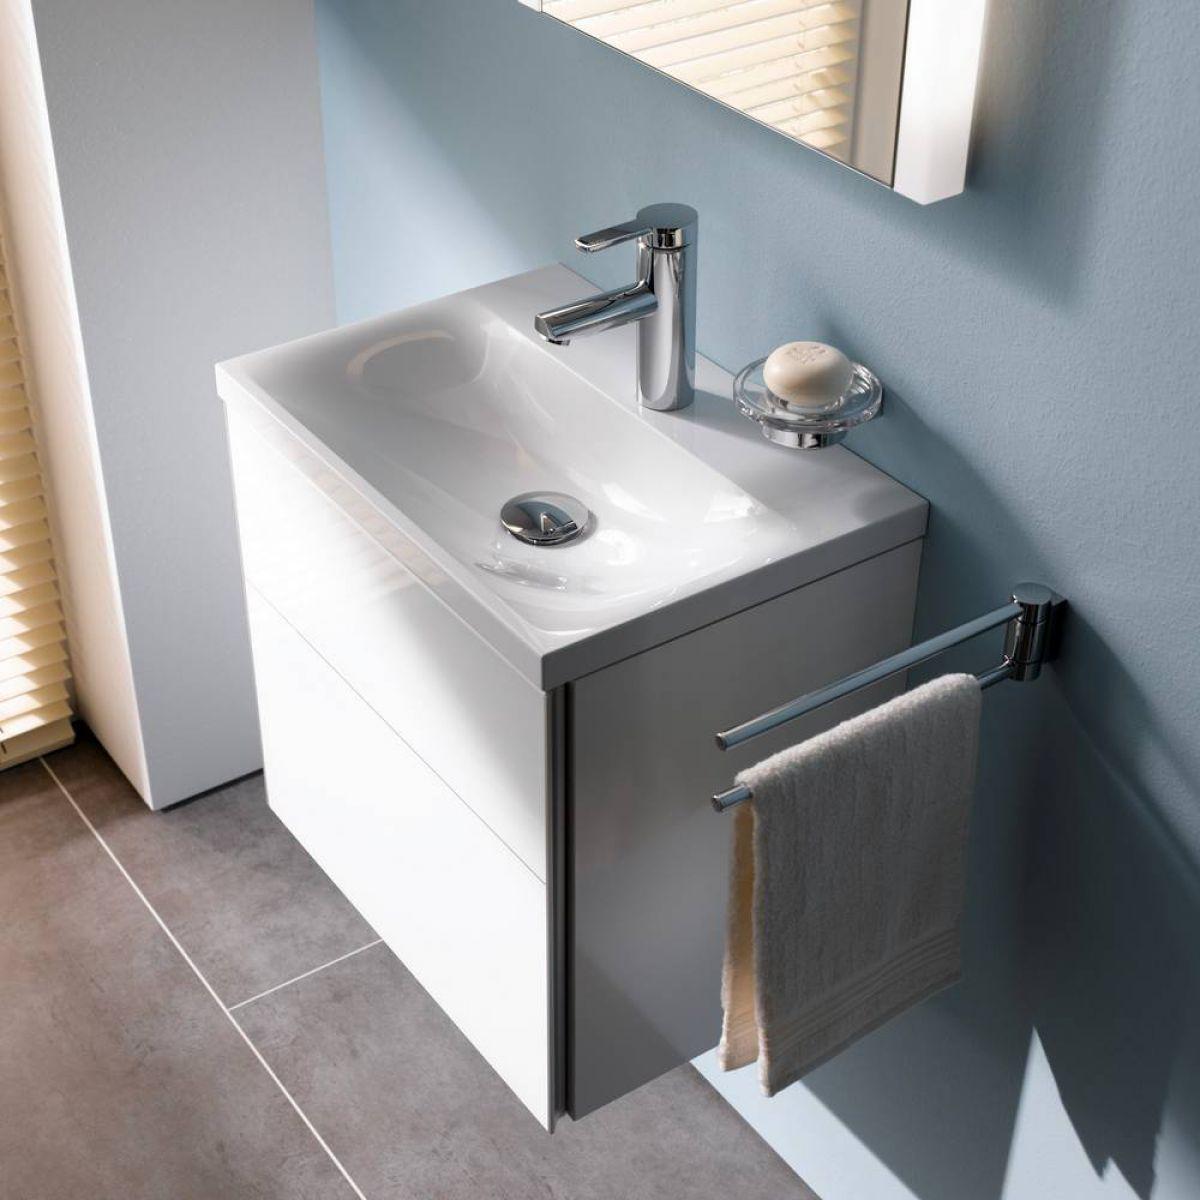 Keuco Royal Reflex Cloakroom Vanity Unit with Basin. Keuco Royal Reflex Cloakroom Vanity Unit with Basin   UK Bathrooms